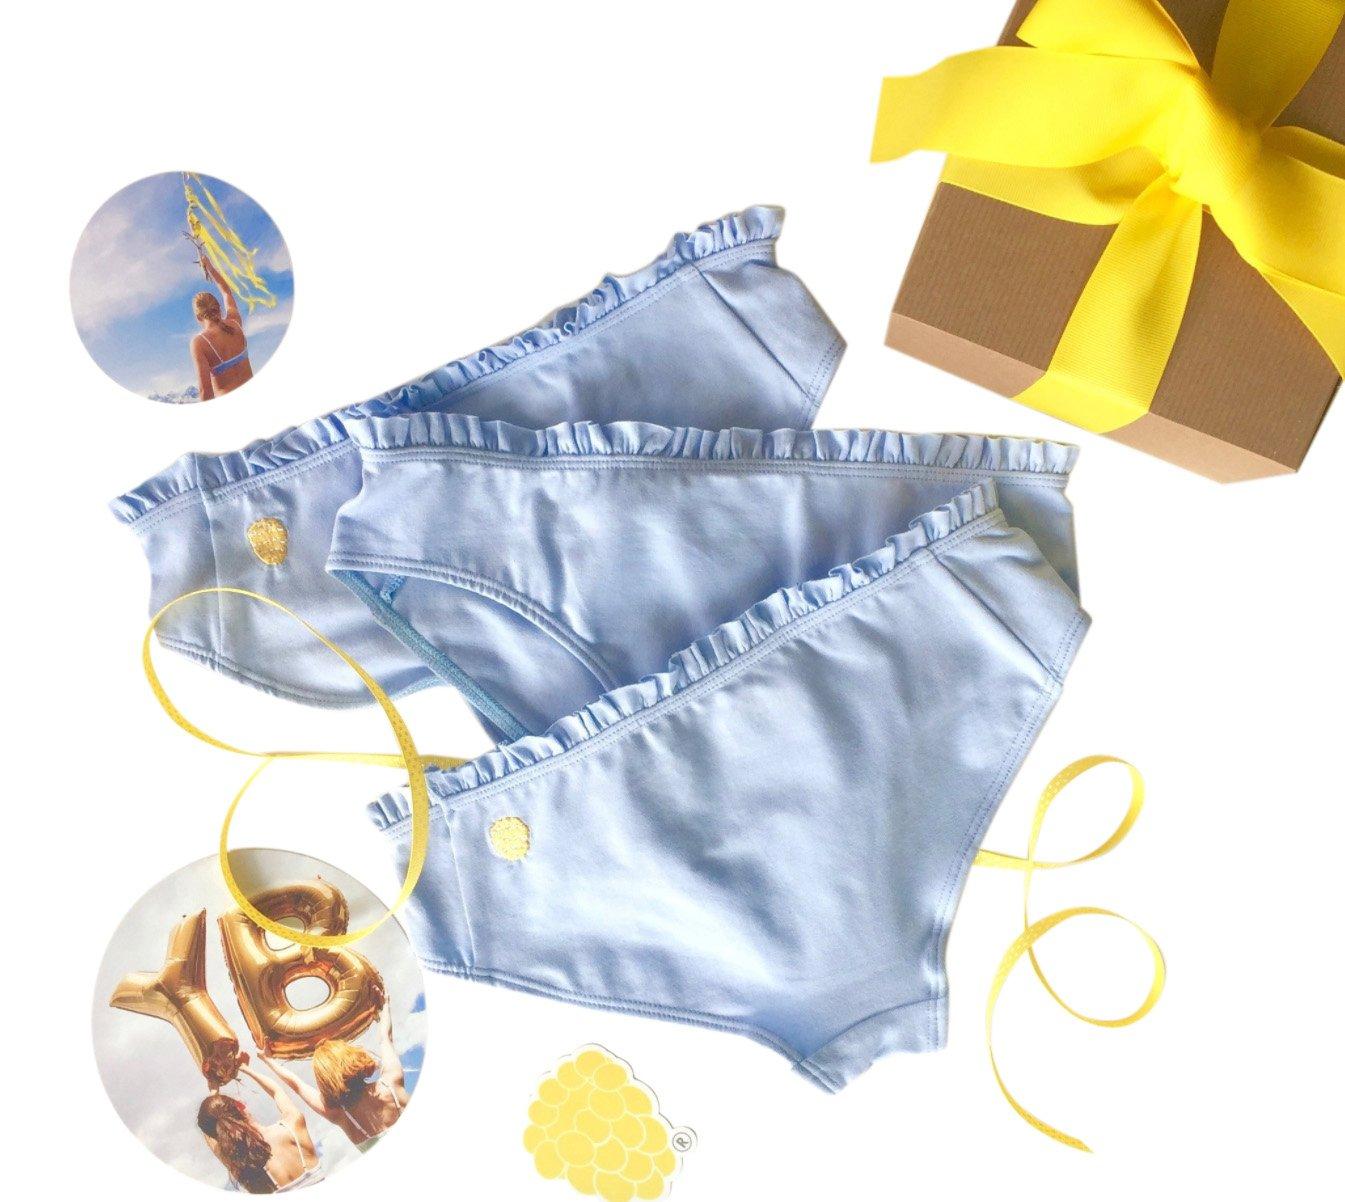 Yellowberry Pom Pom Underwear Bundle - Cutest Ruffle Cotton Bikini - Great for Girls, Tweens and Teens! (LG, Raindrop)